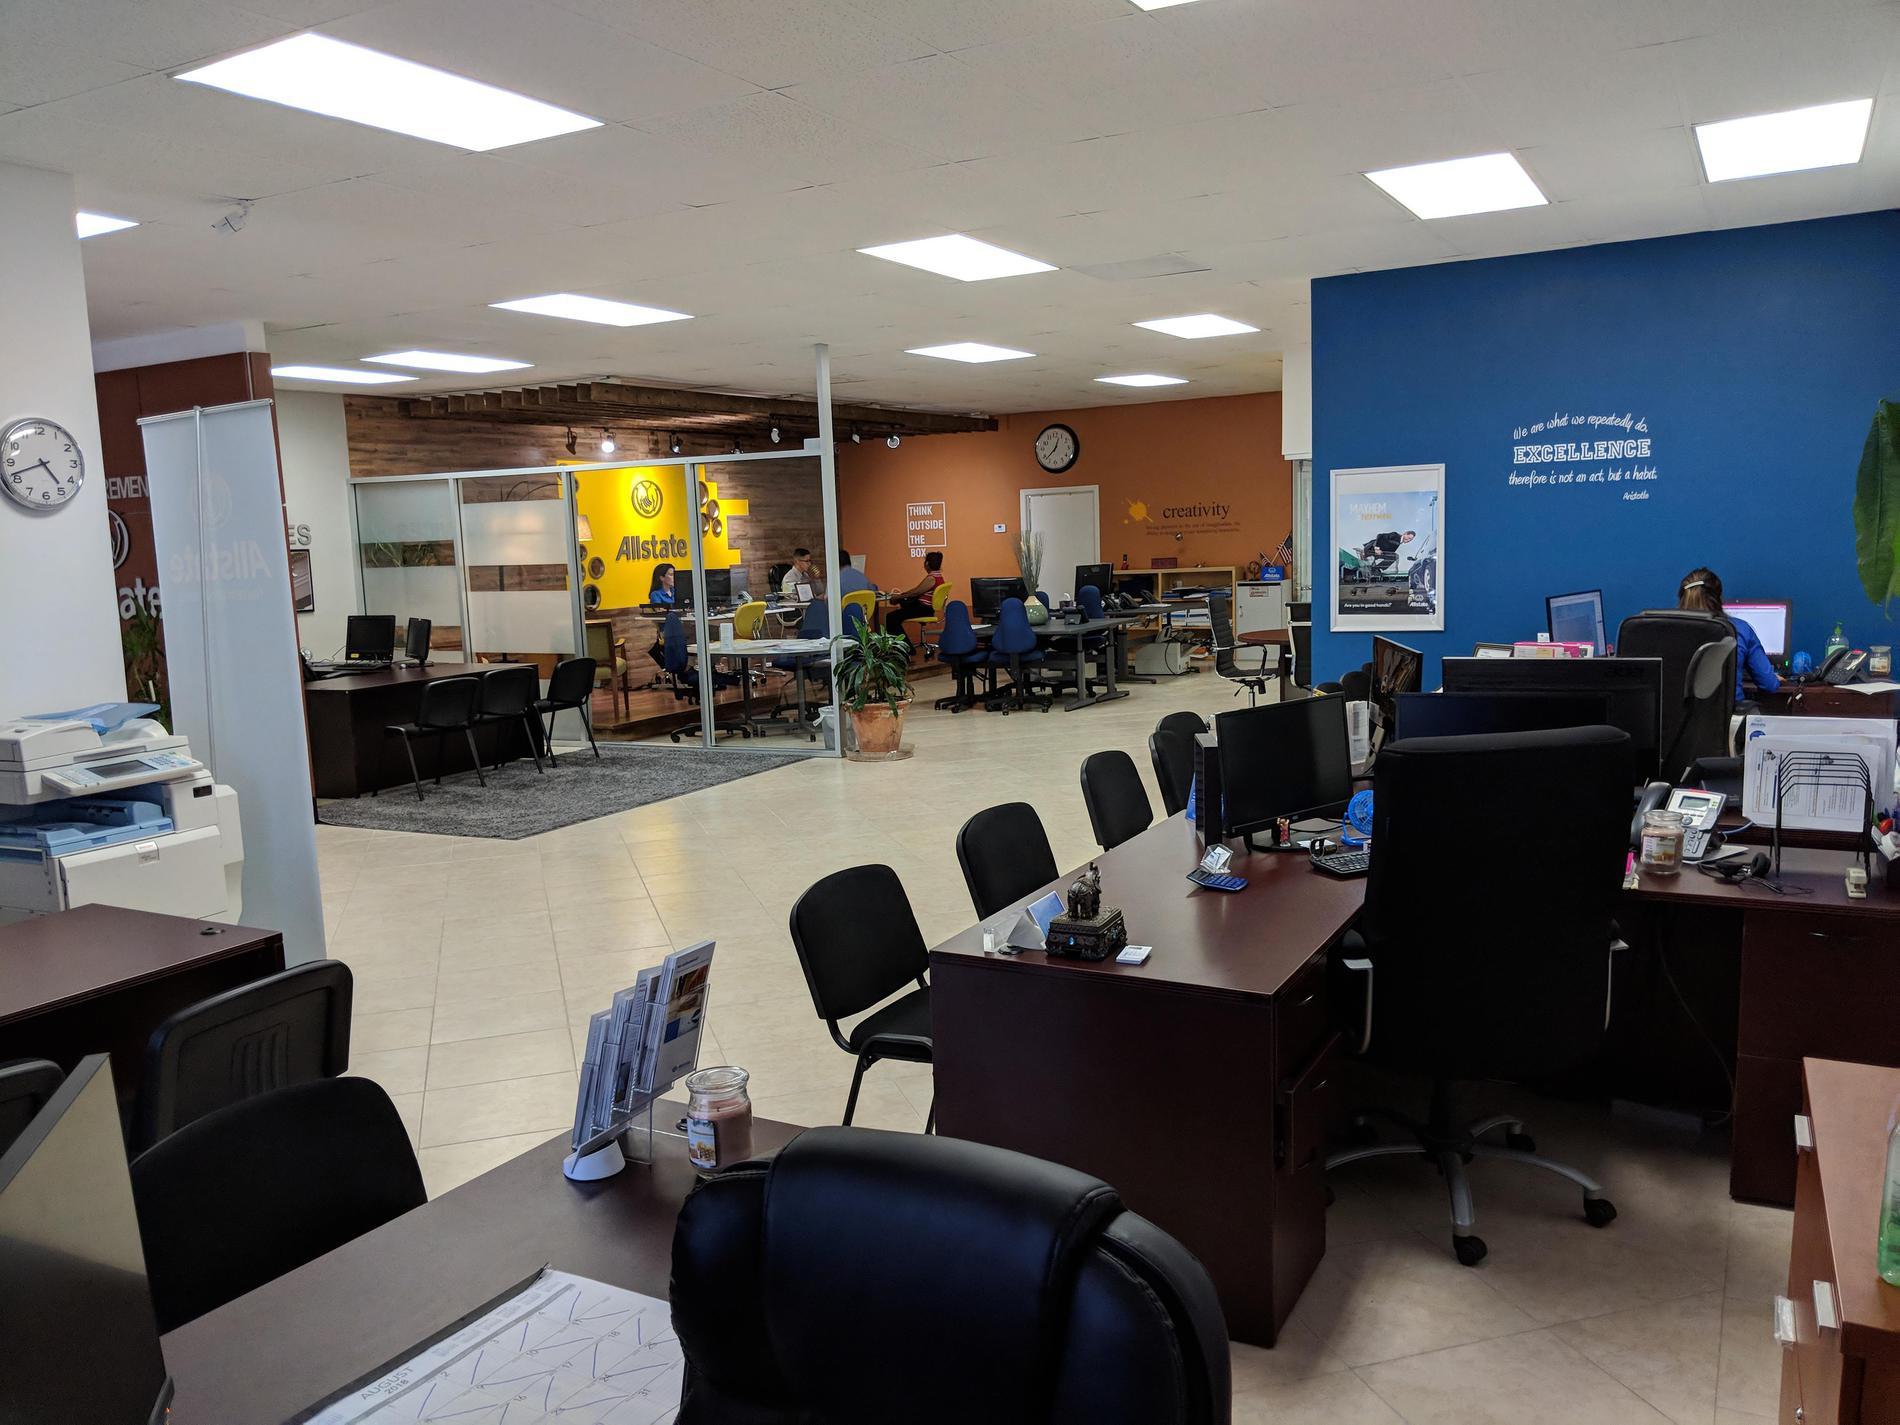 Allstate | Car Insurance in Santa Ana, CA - Octavio R Pina